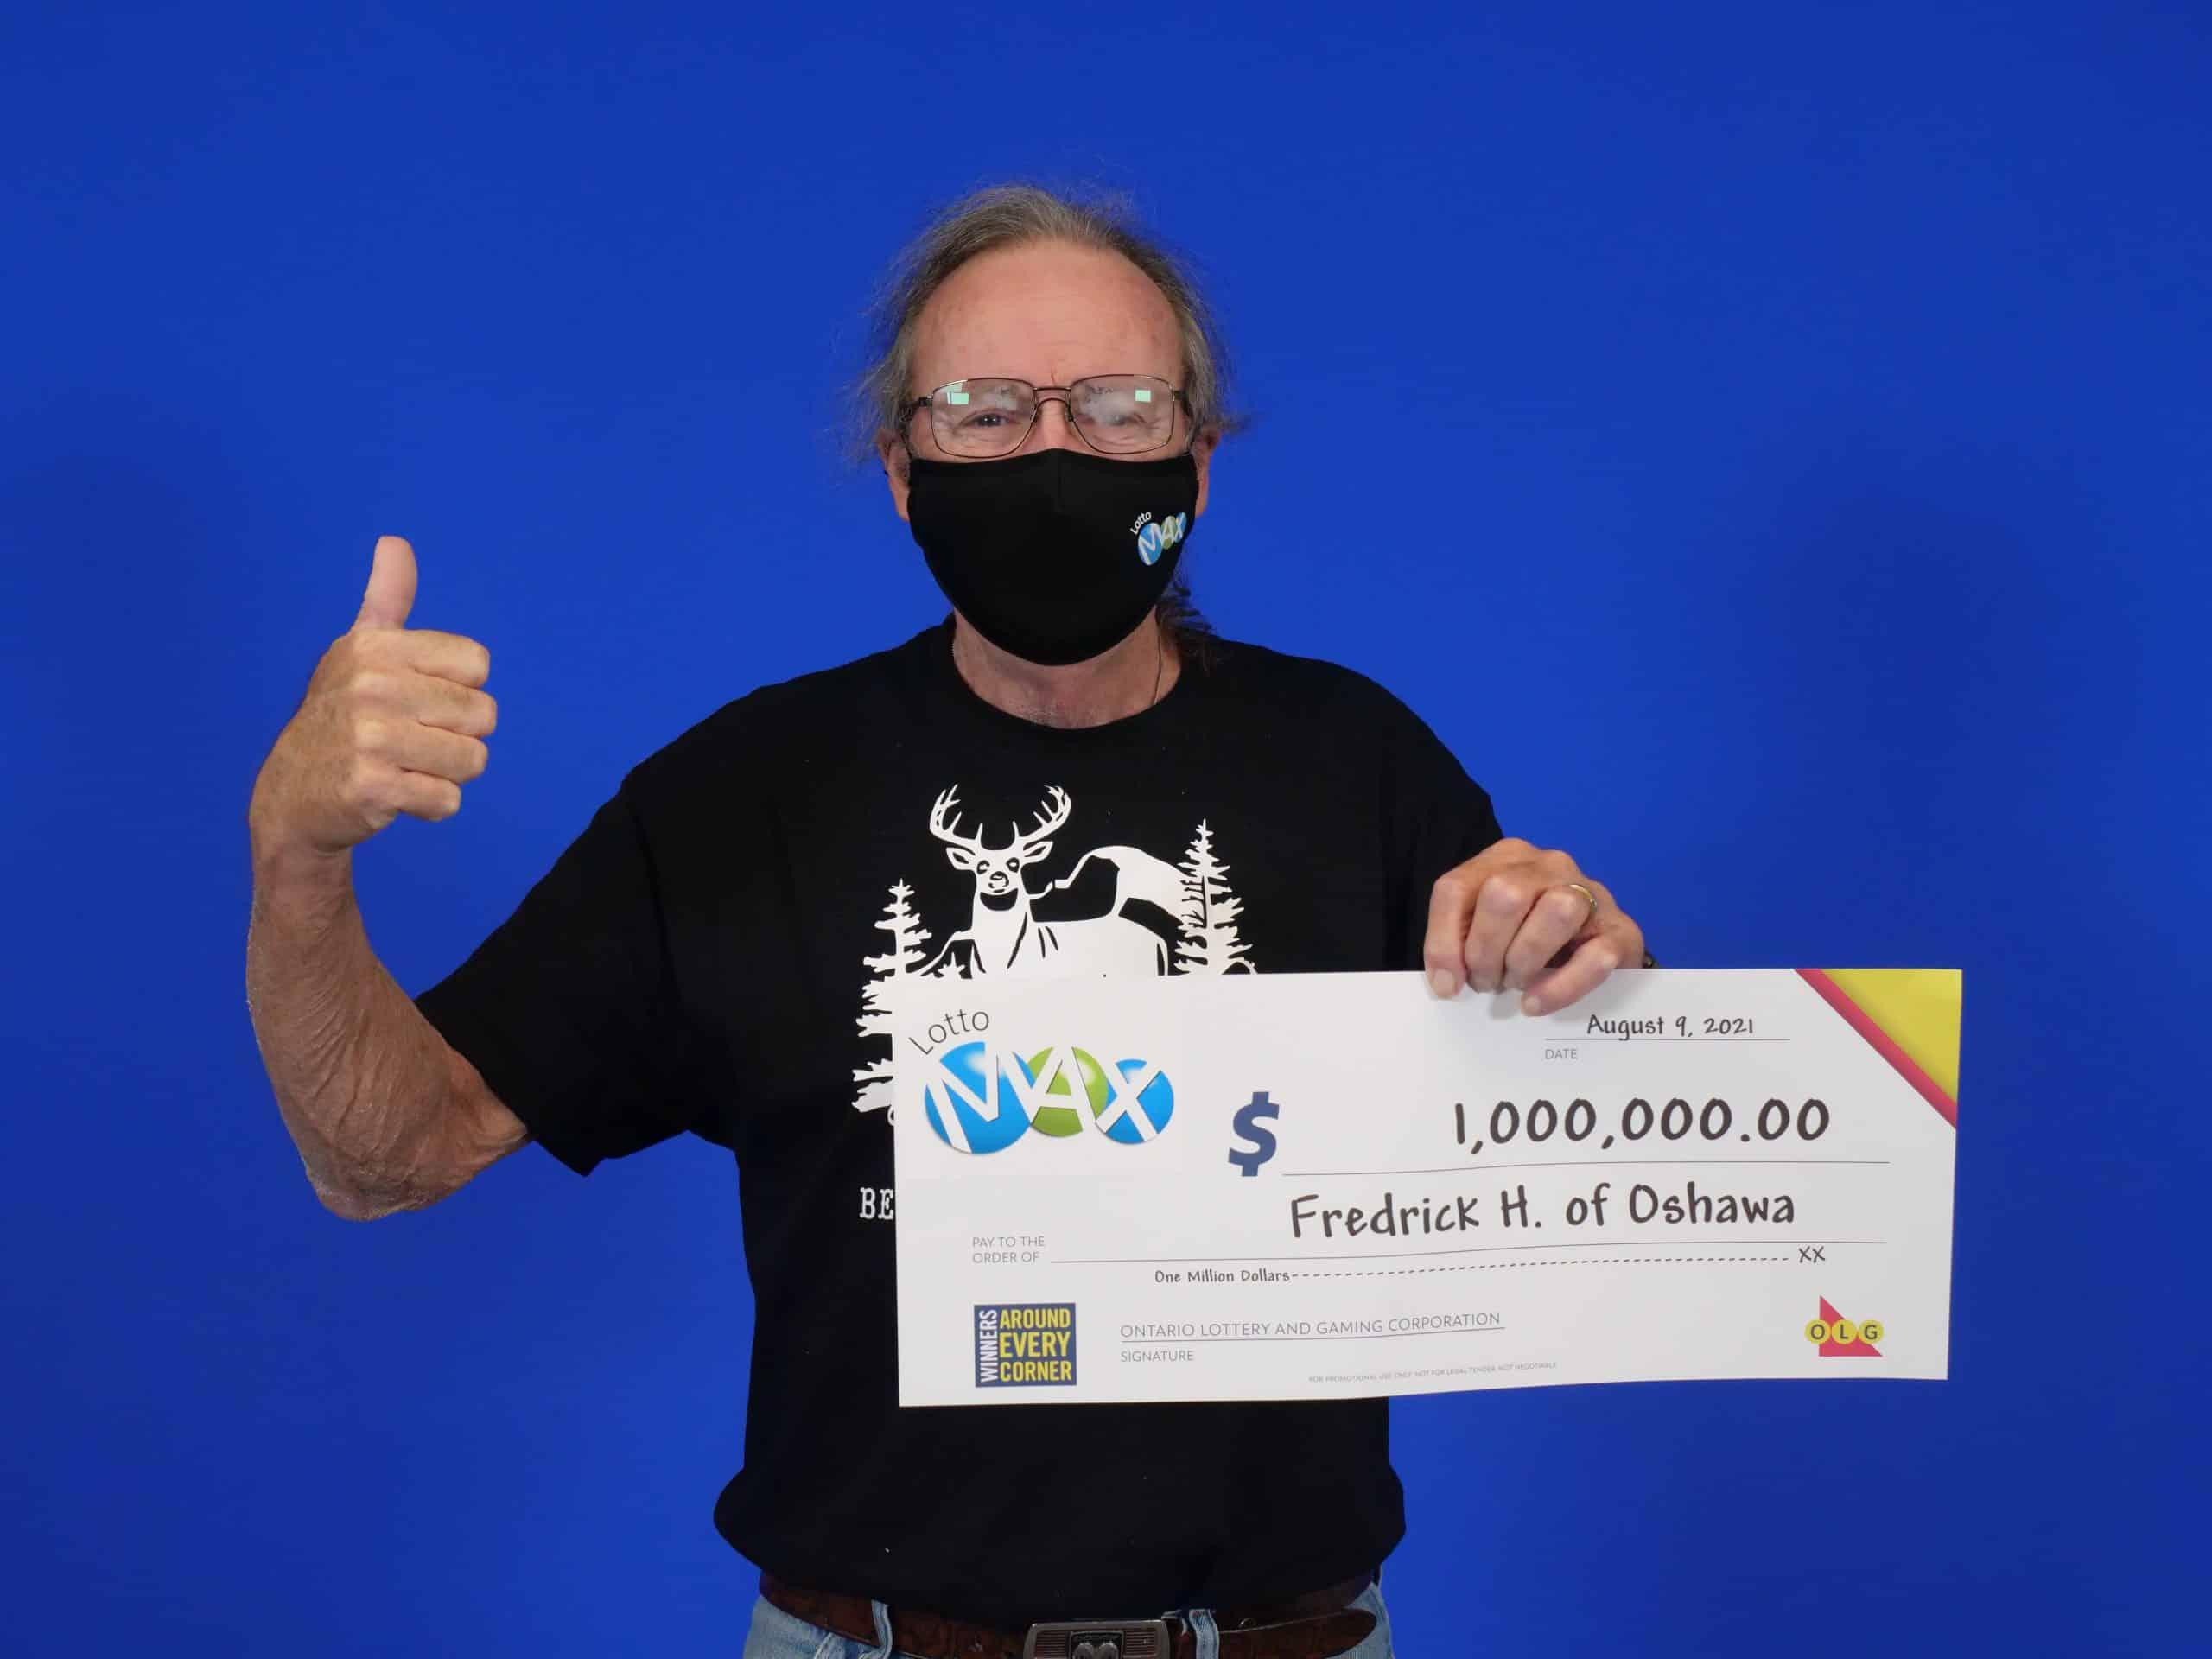 lotto_max_maxmillions_june_15_2021_1000000